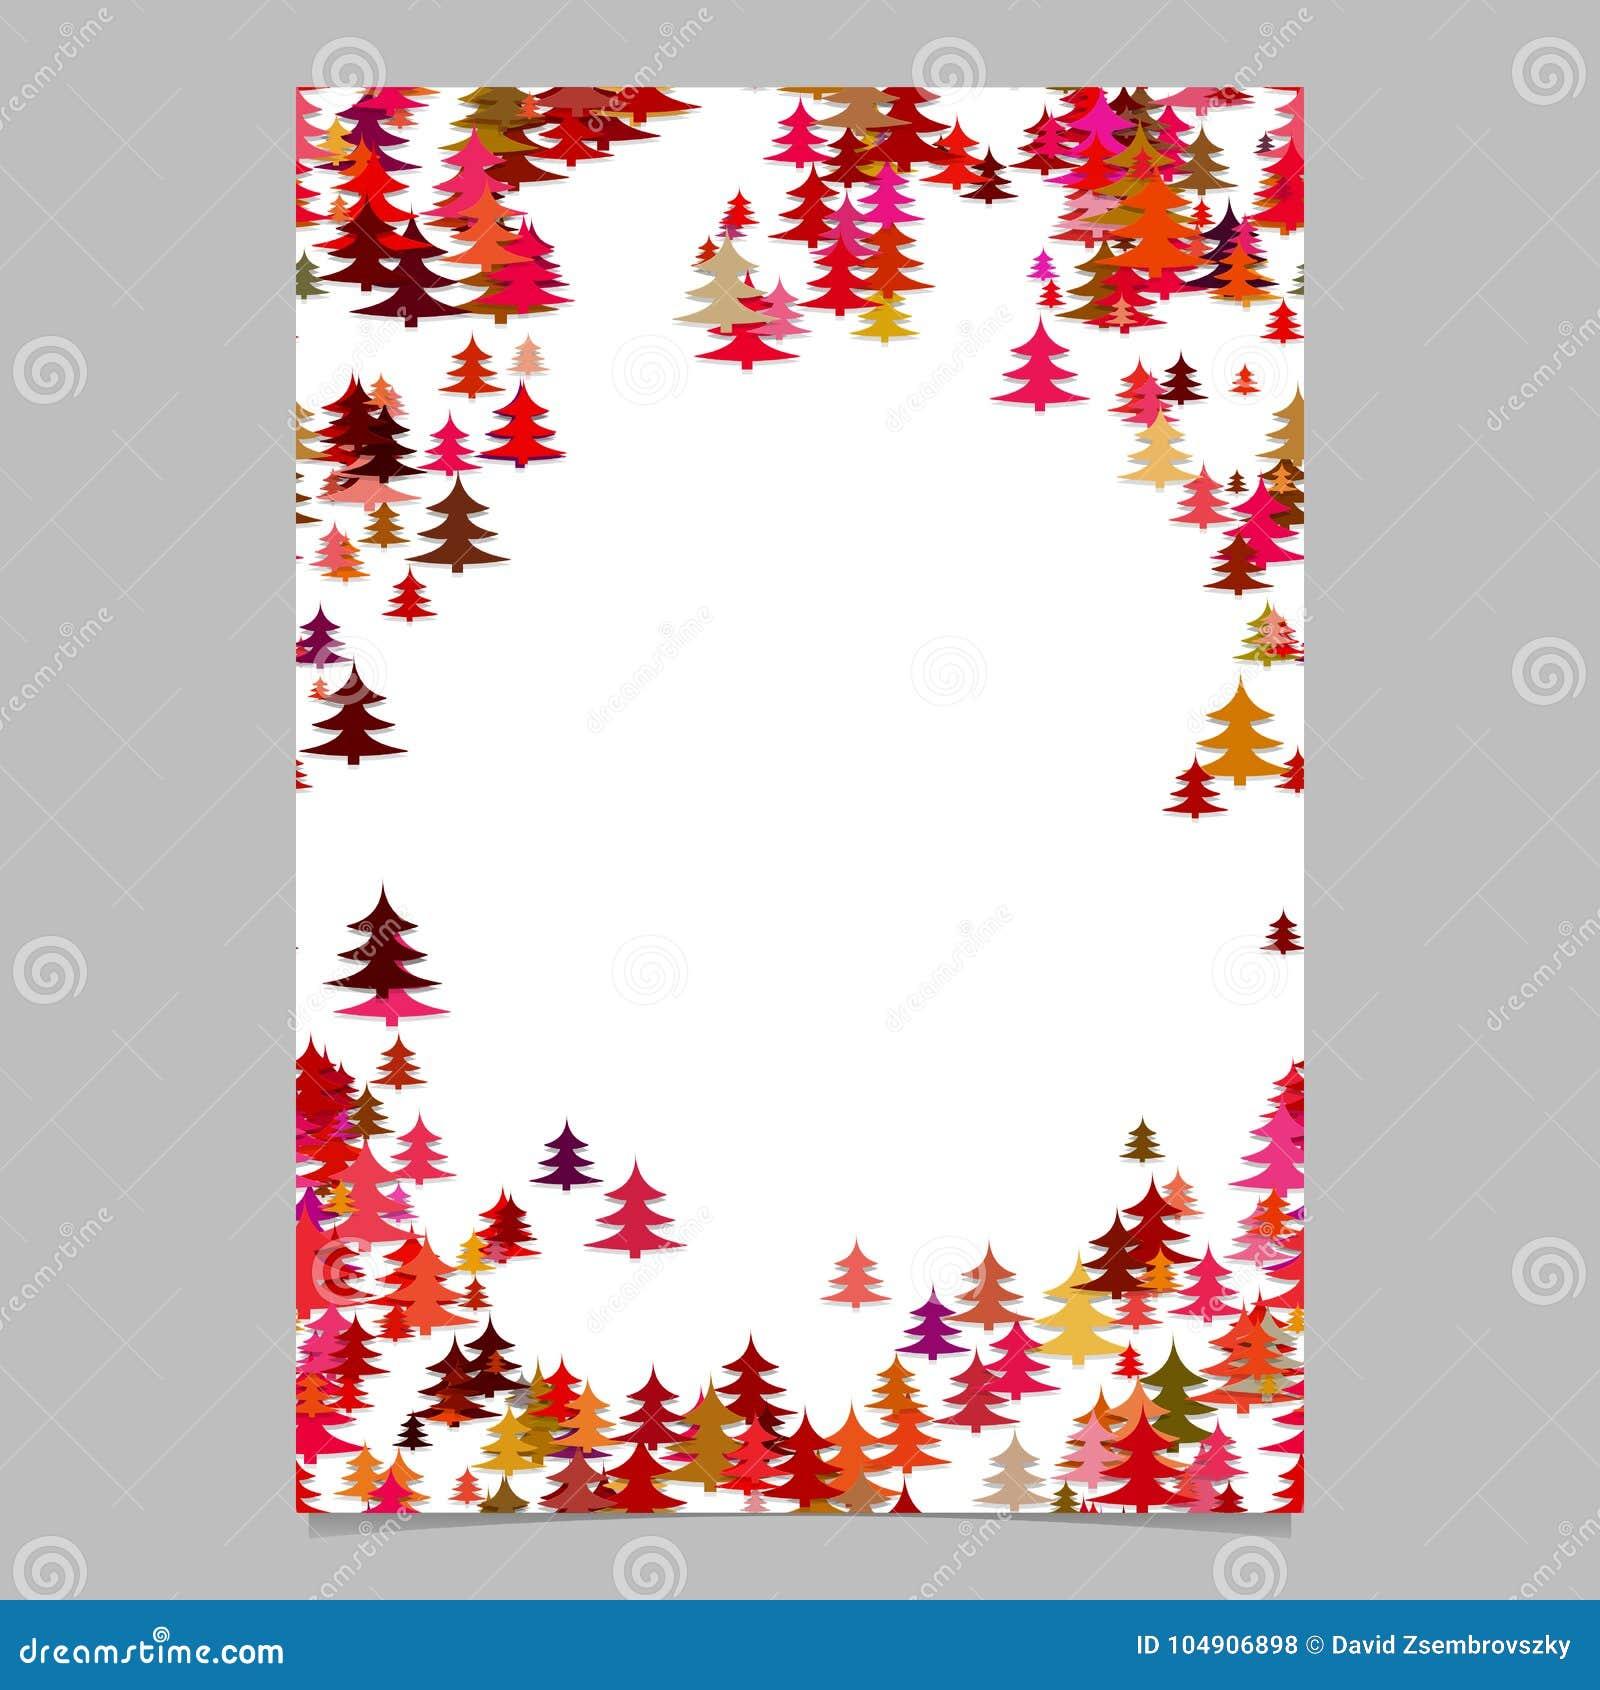 modern holiday pine tree presentation template